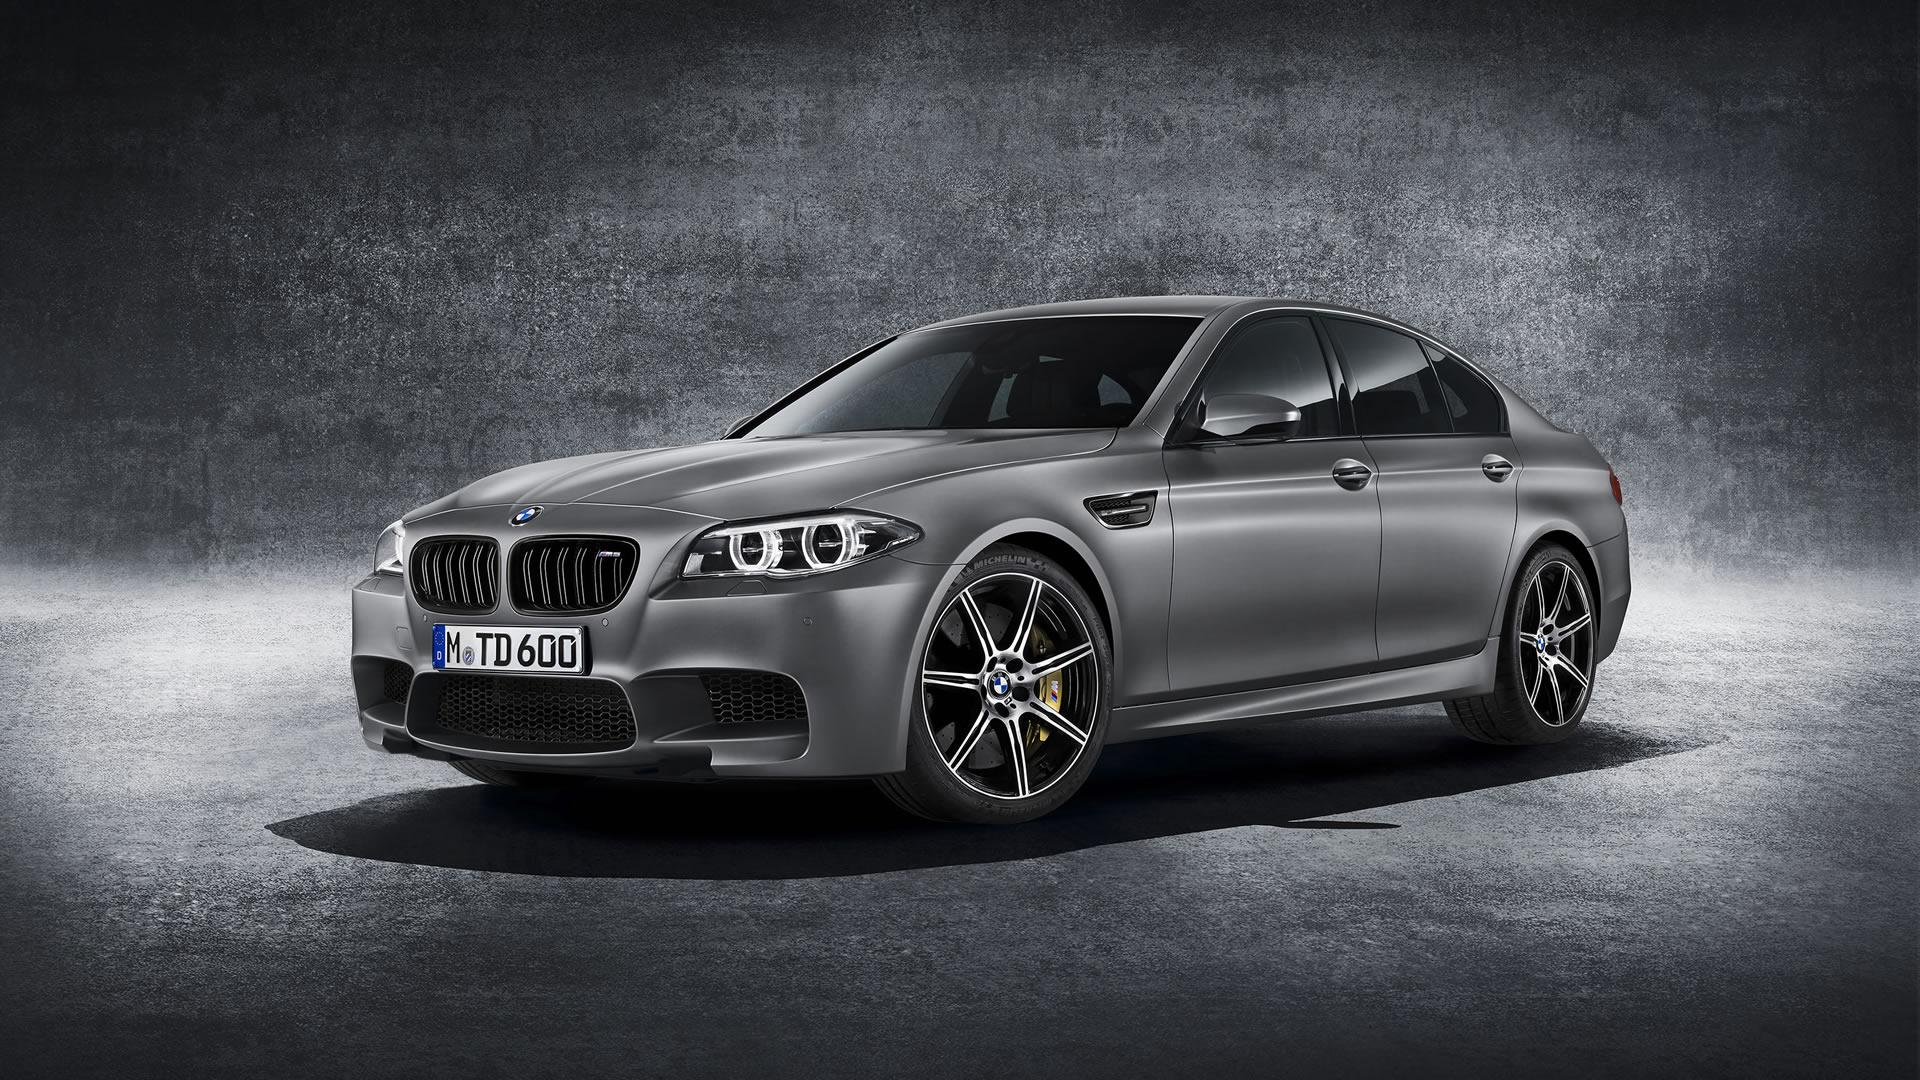 2015 BMW M5 30th Anniversary Edition Wallpaper   1920 x 1080 Frozen 1920x1080